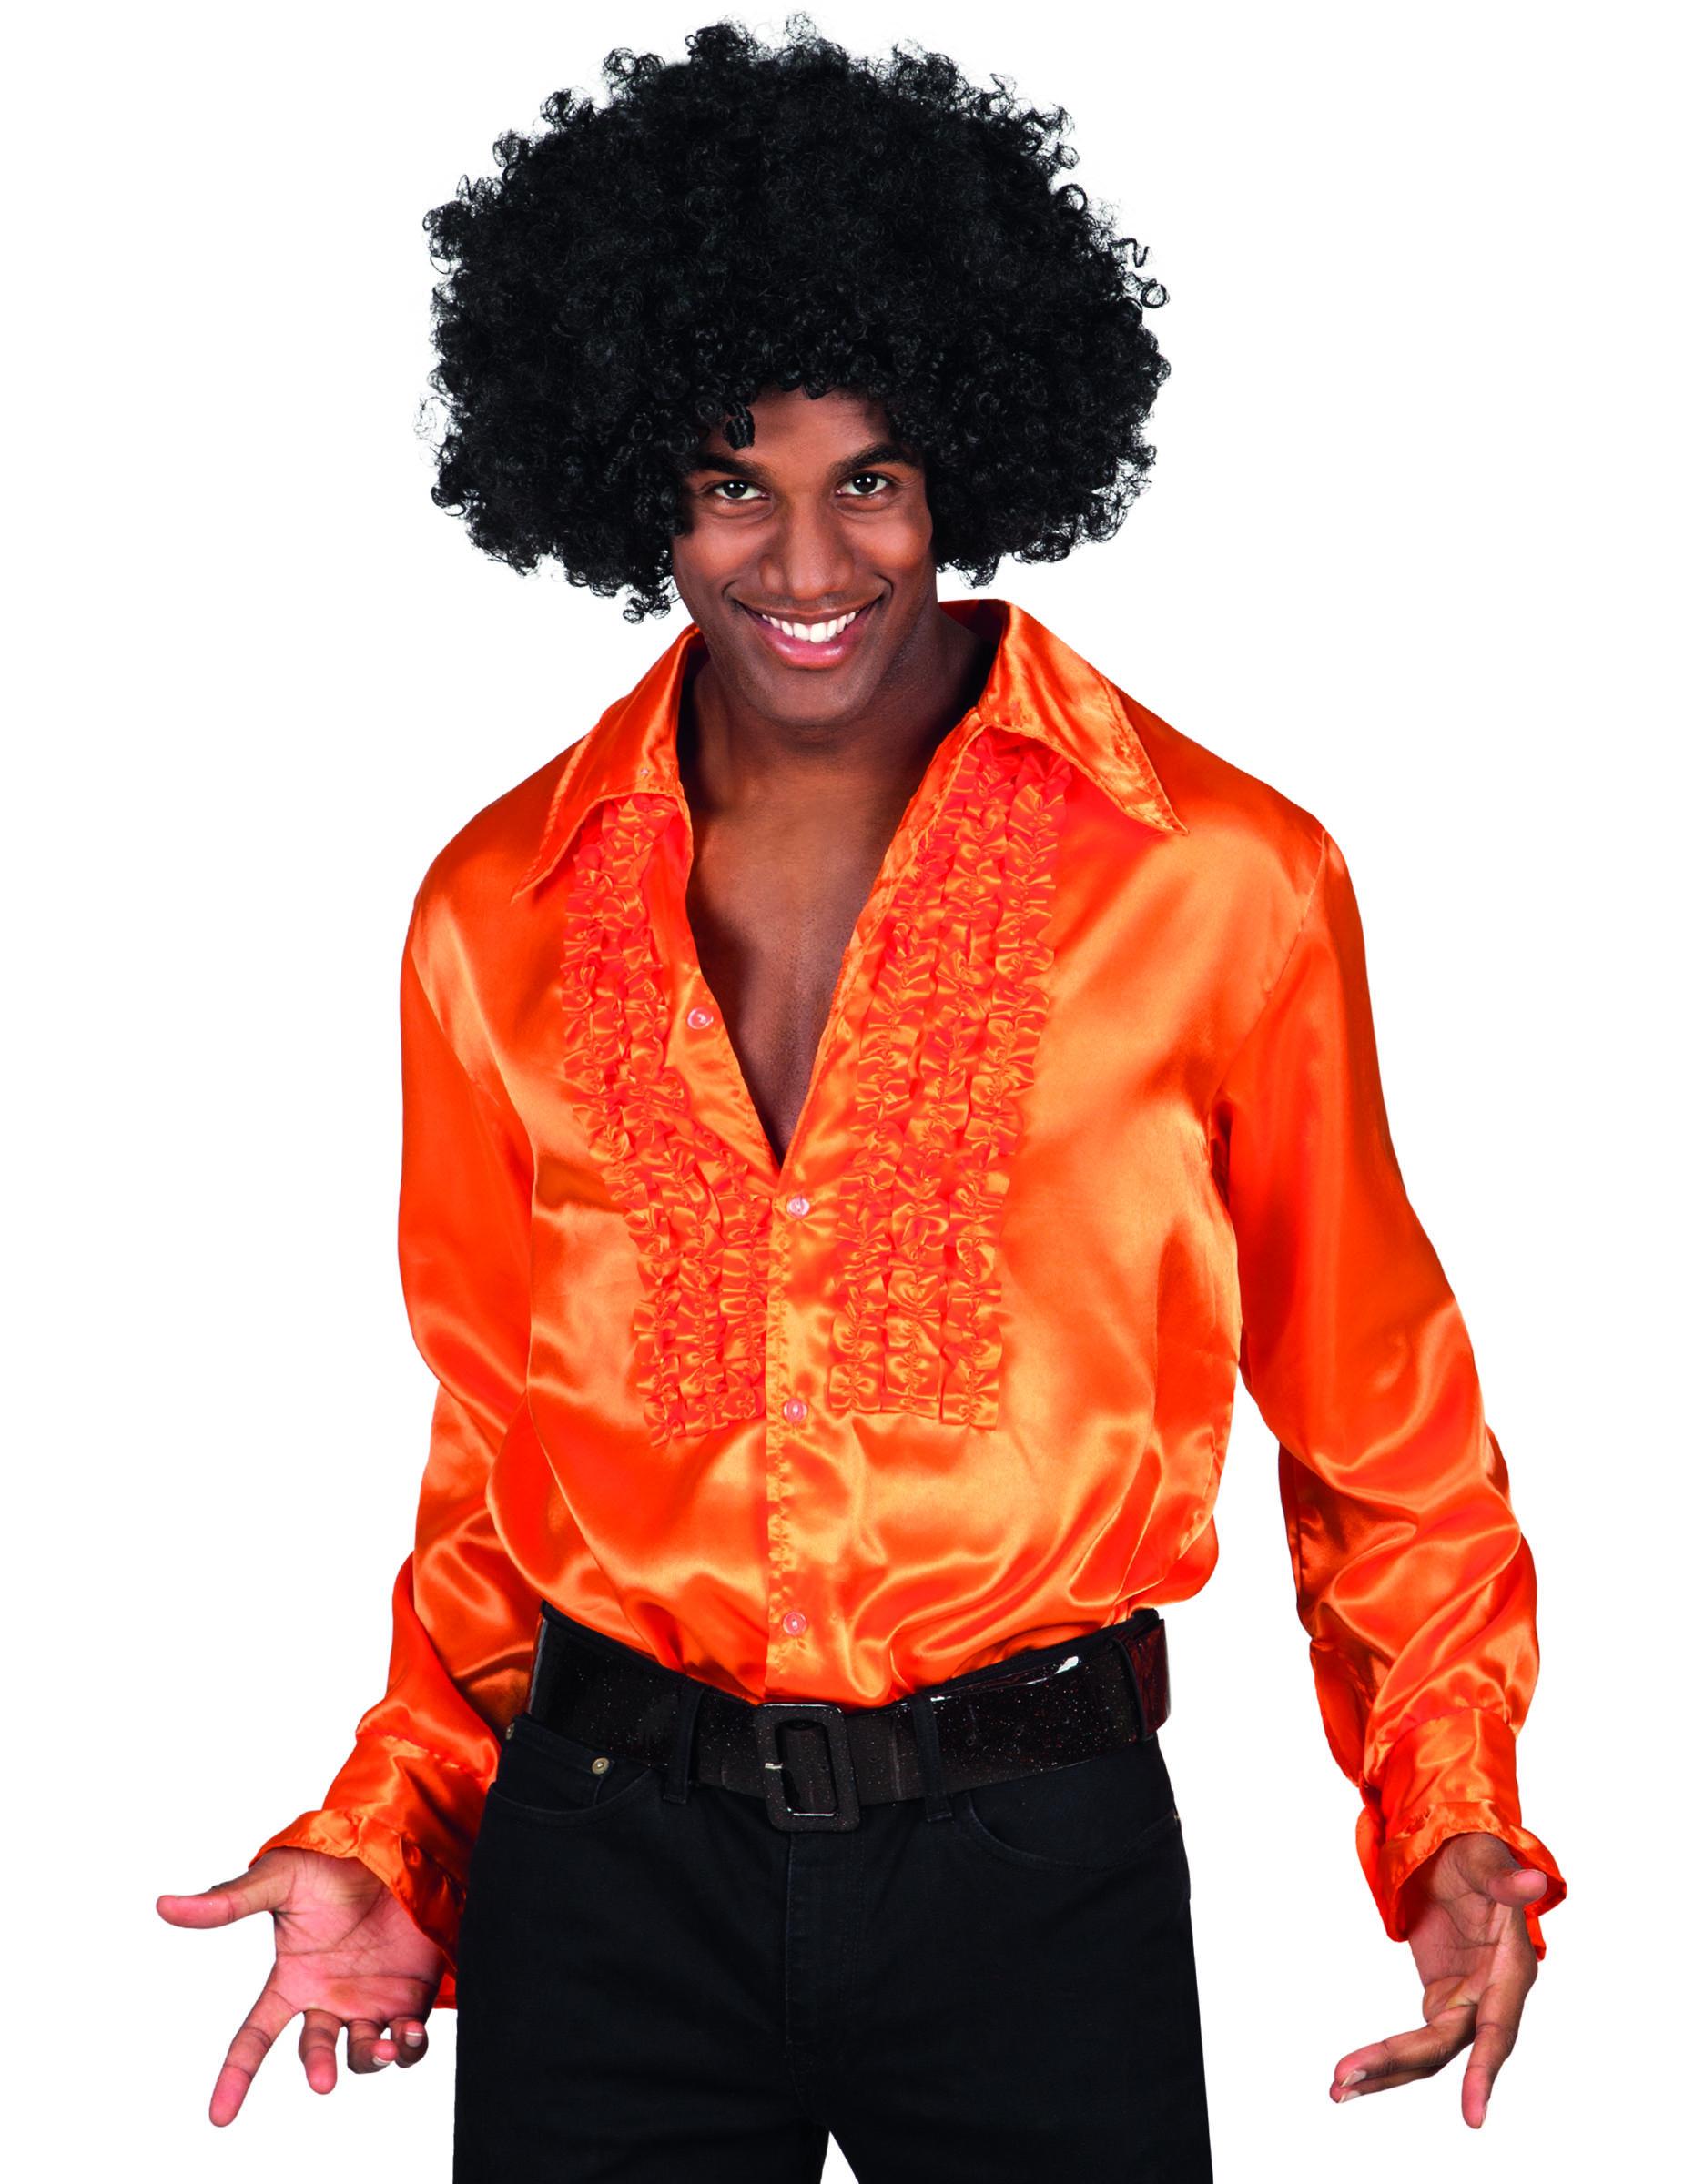 chemise disco orange homme d coration anniversaire et. Black Bedroom Furniture Sets. Home Design Ideas